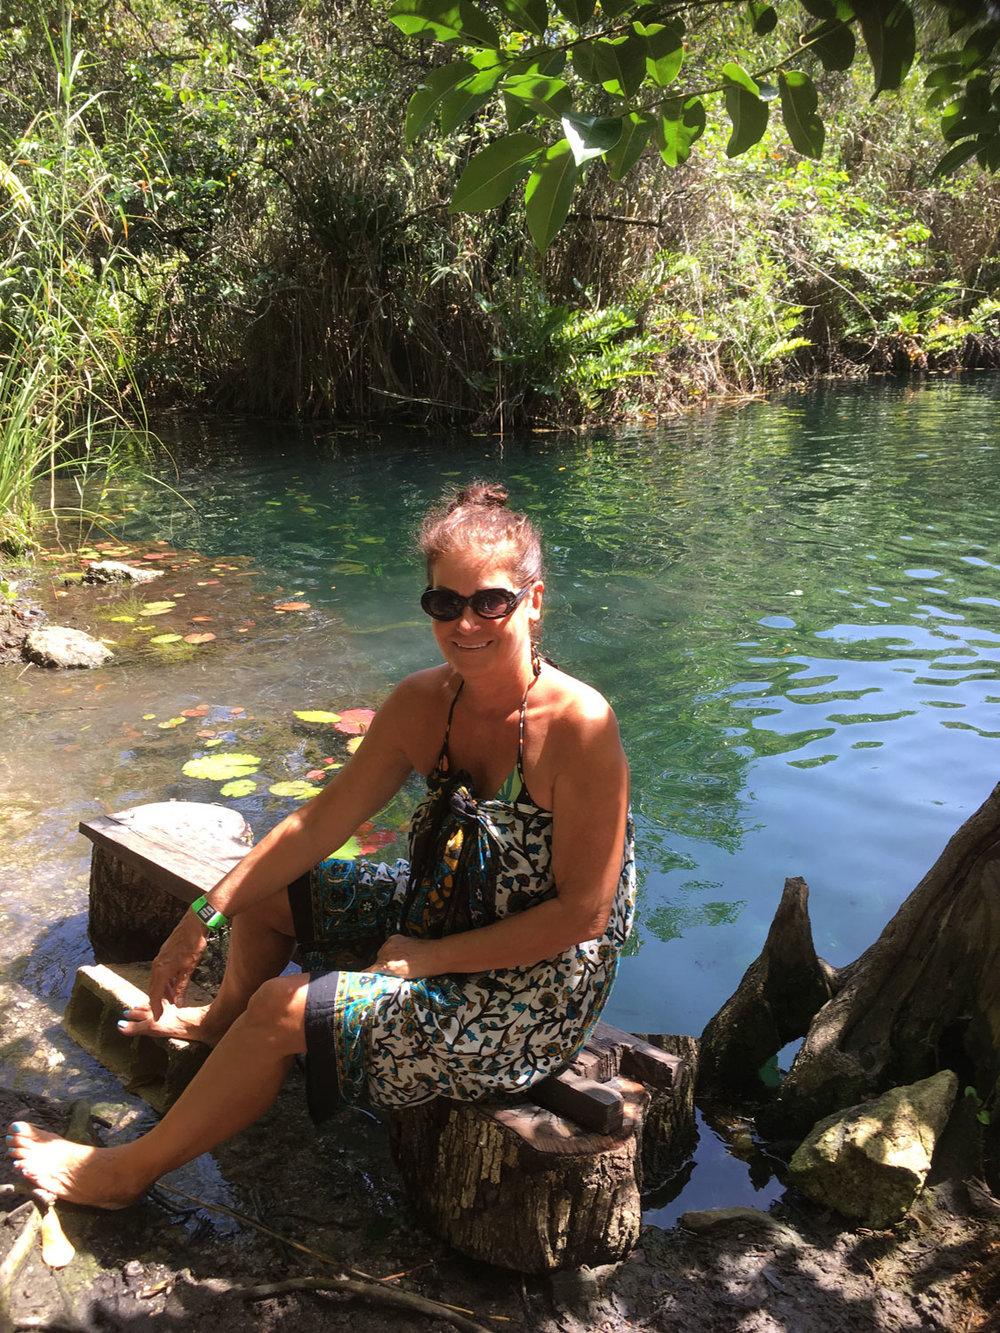 Hammocks_and_Ruins_Riviera_Maya_What_to_Do_Playa_Del_Carmen_Tulum_Cenotes_Cenote_Escondido_15.jpg